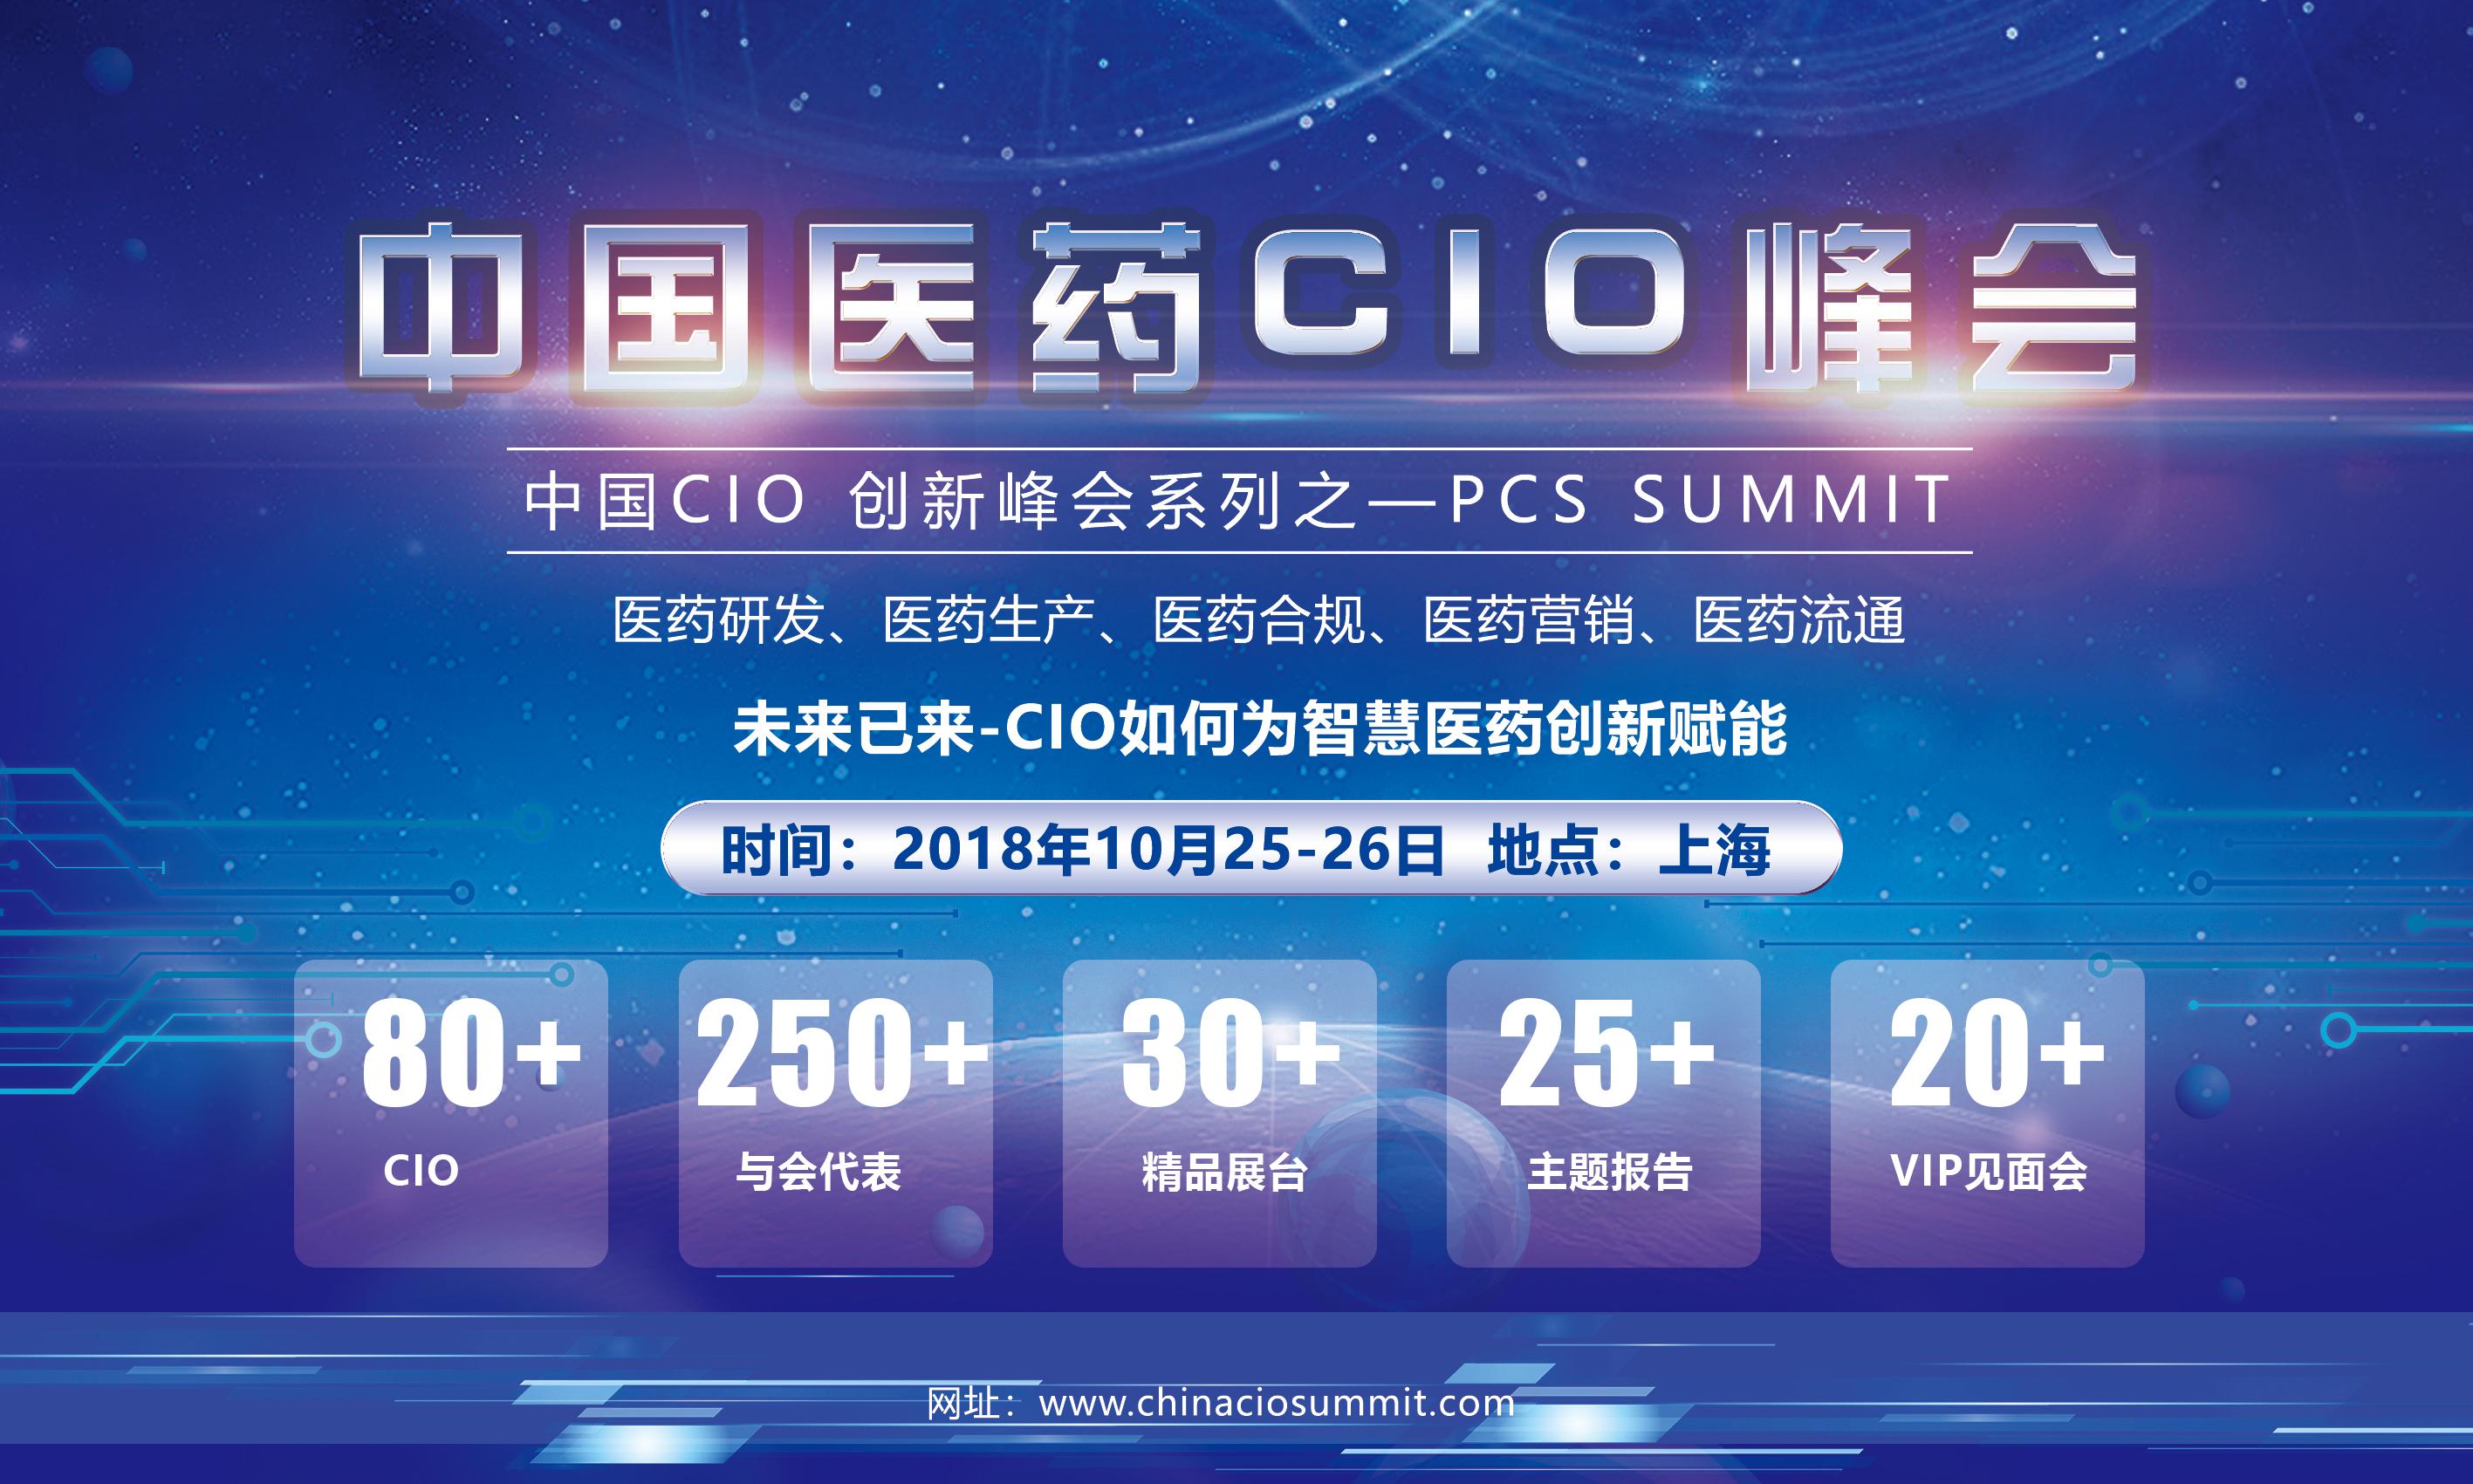 PCS2018中国医药CIO峰会圆满落幕!大咖发声,论道医药数字化转型